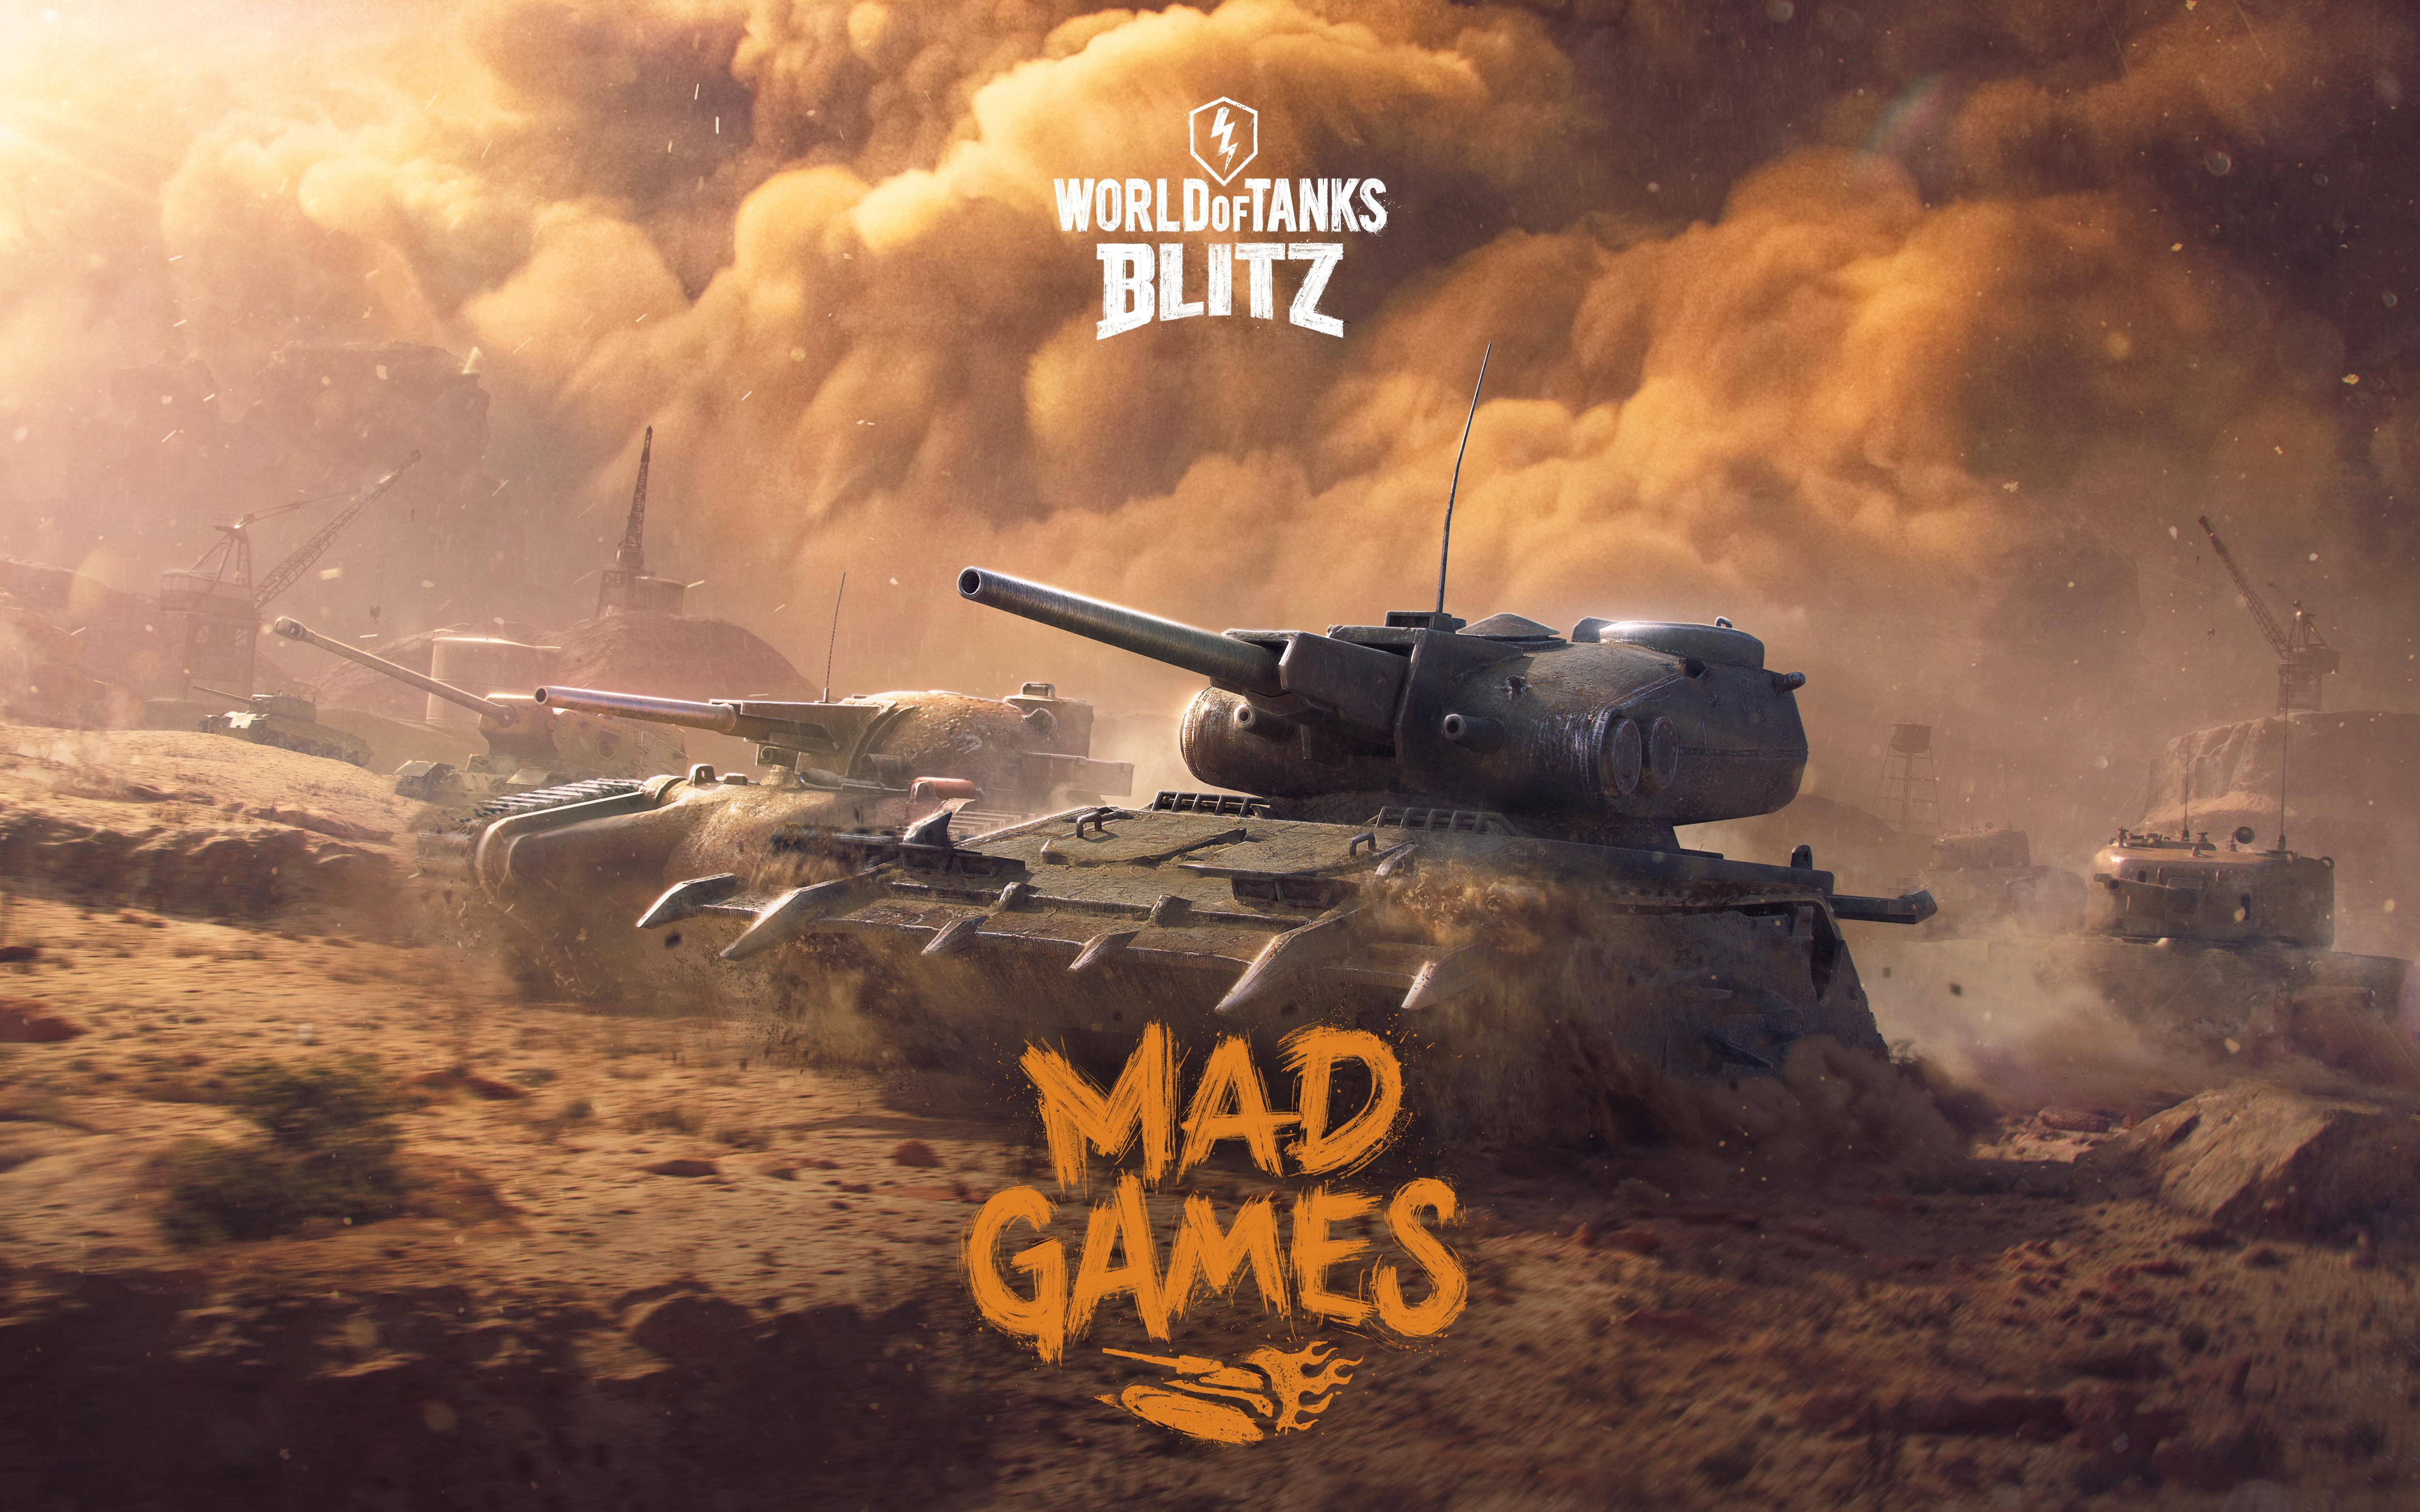 3840x2160 World Of Tanks Blitz Mad Games 2018 5k 4k HD 4k ...